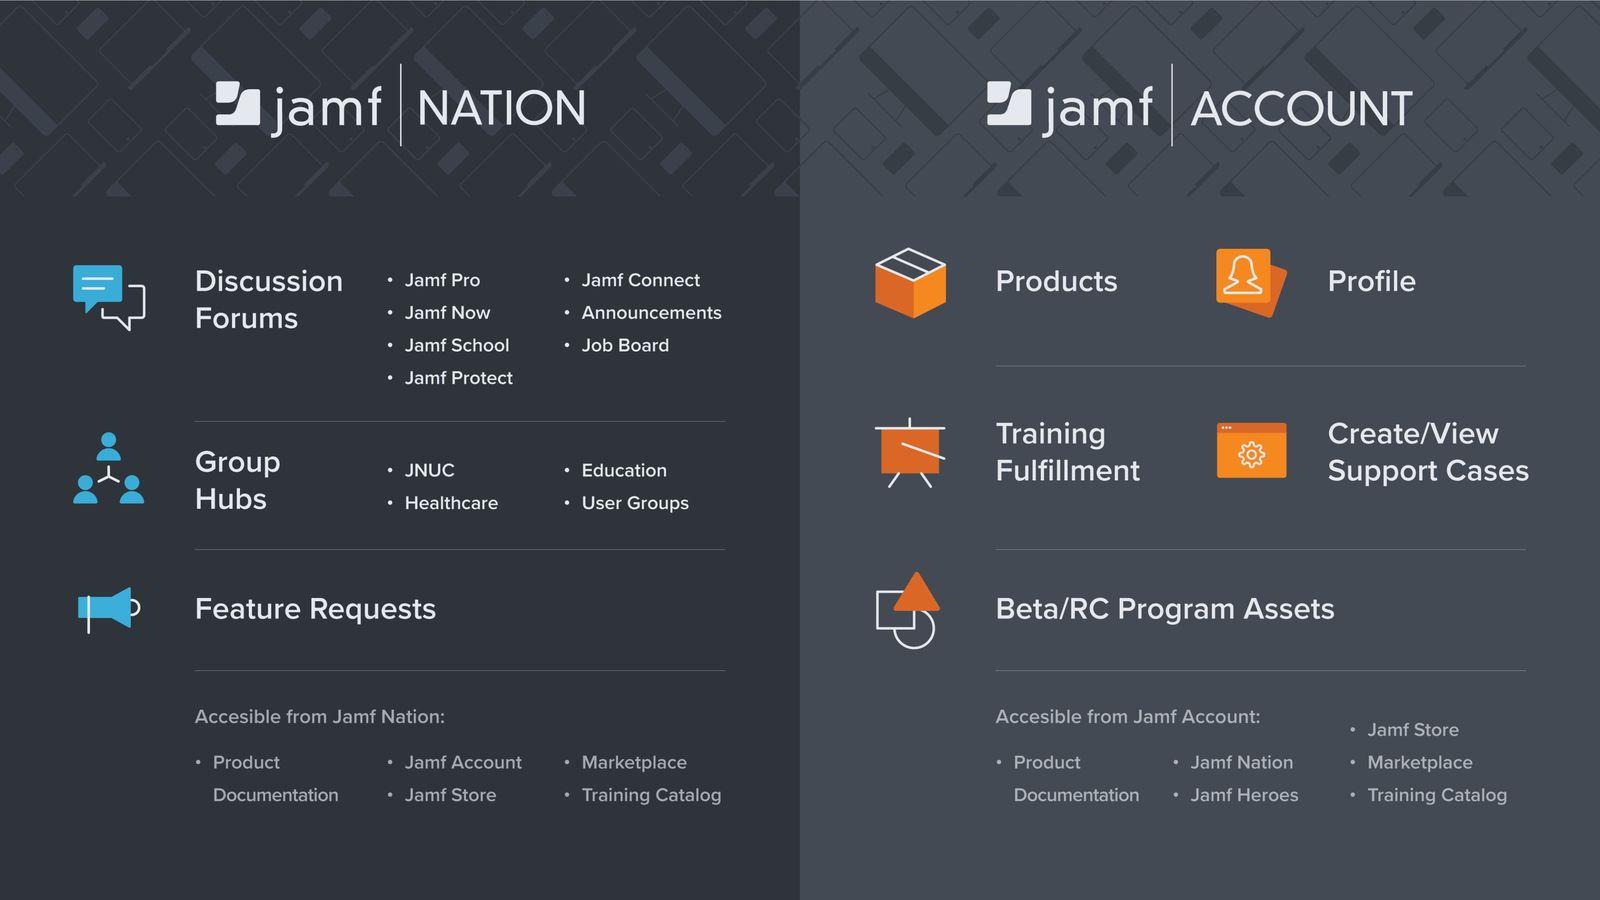 Comparison chart of Jamf Nation v. Jamf Account